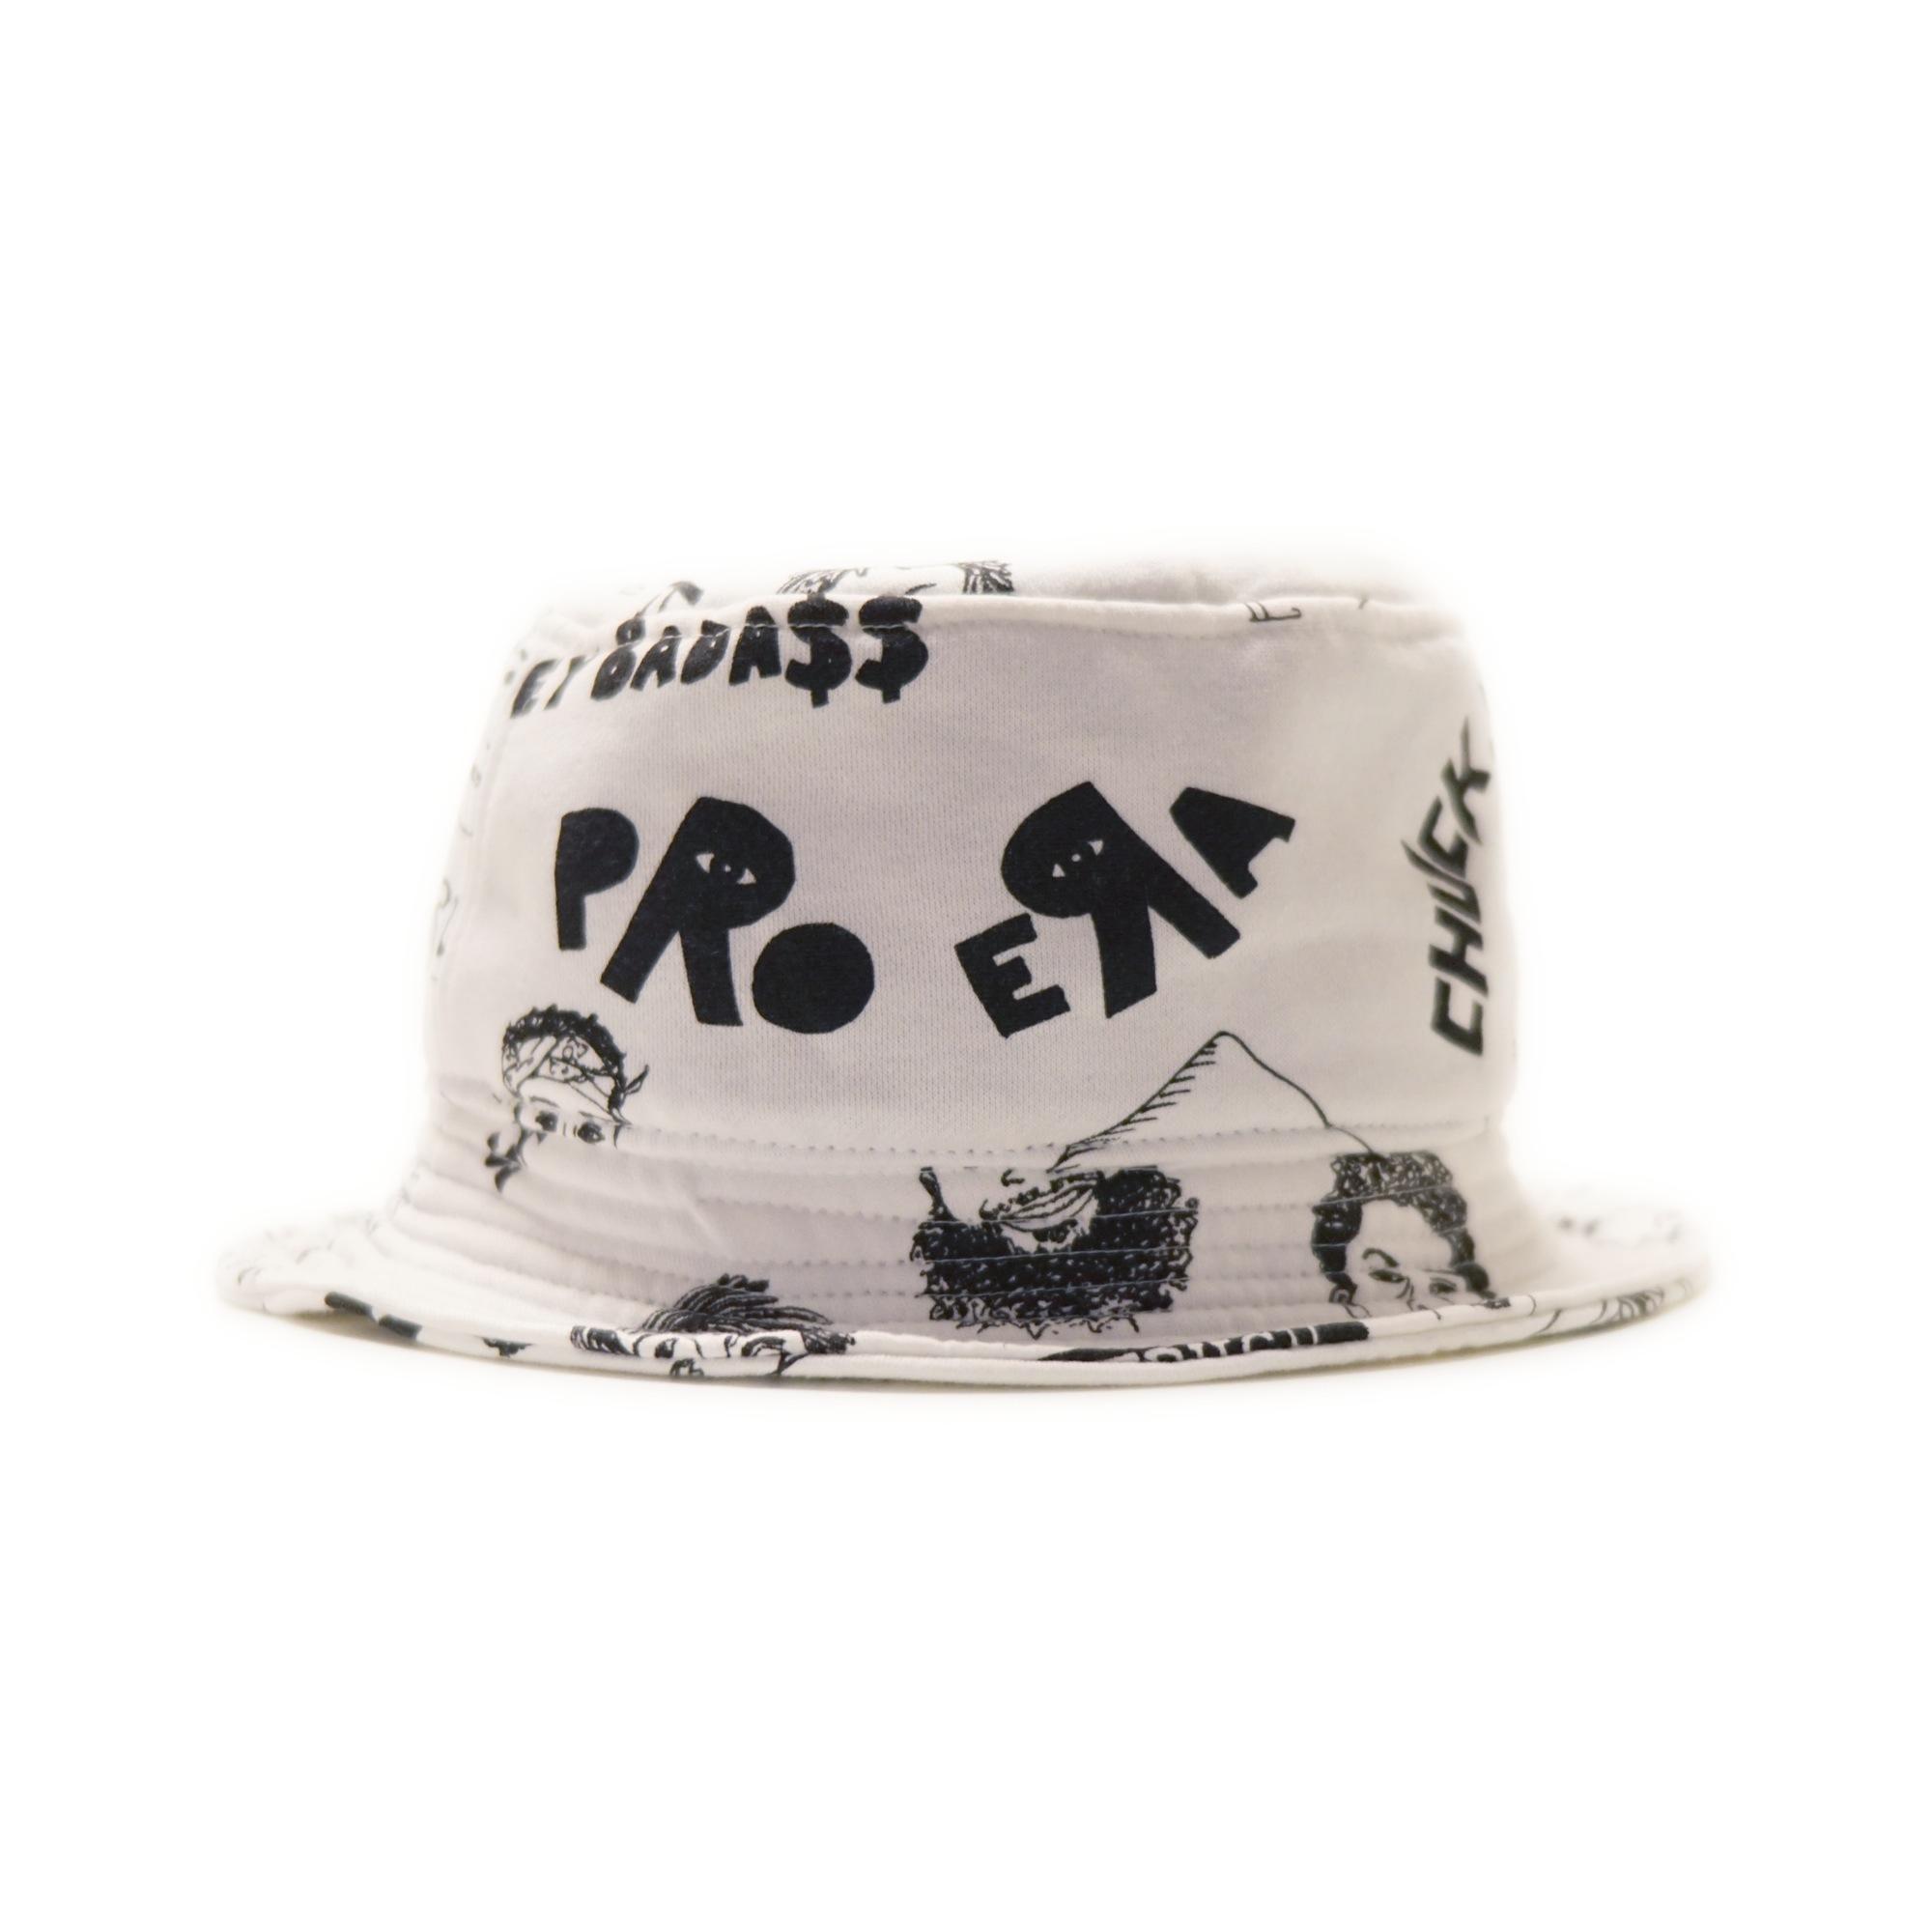 KIDSUPER X BEASTCOAST BUCKET HAT